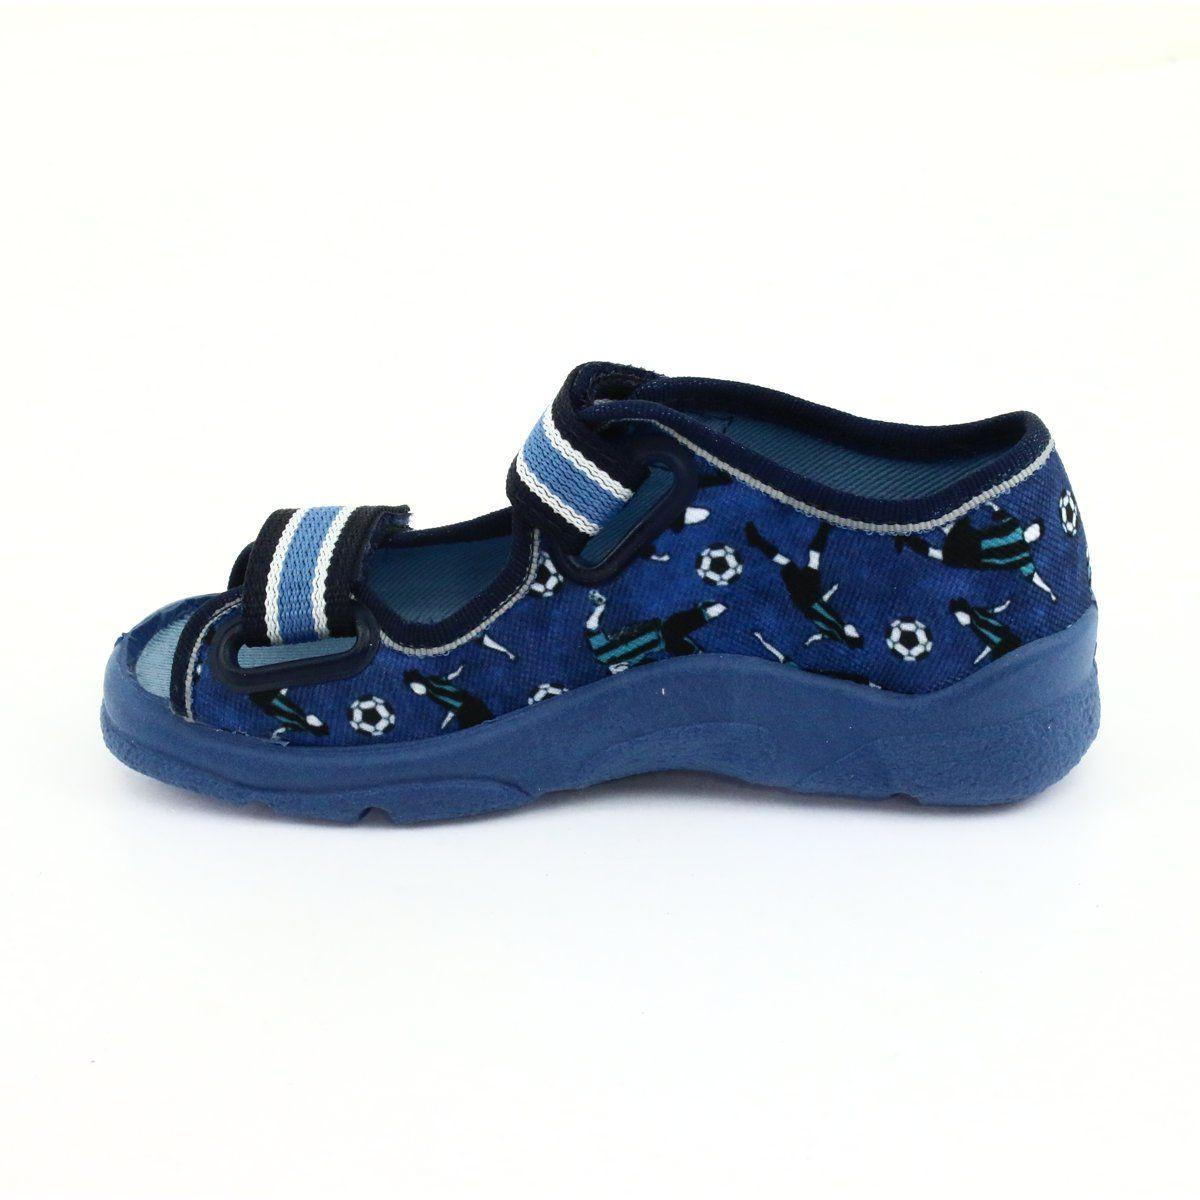 Befado Obuwie Dzieciece 969x141 Childrens Shoes Shoes World Shoes